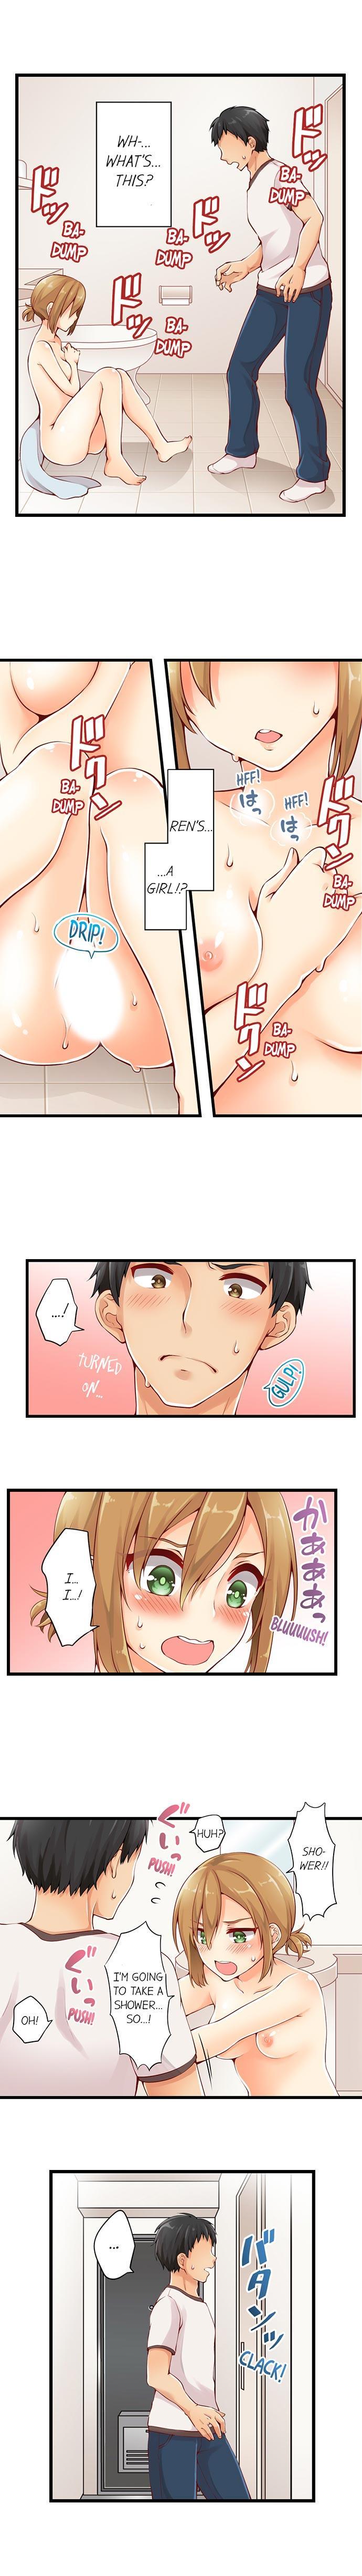 Ren Arisugawa Is Actually A Girl 10